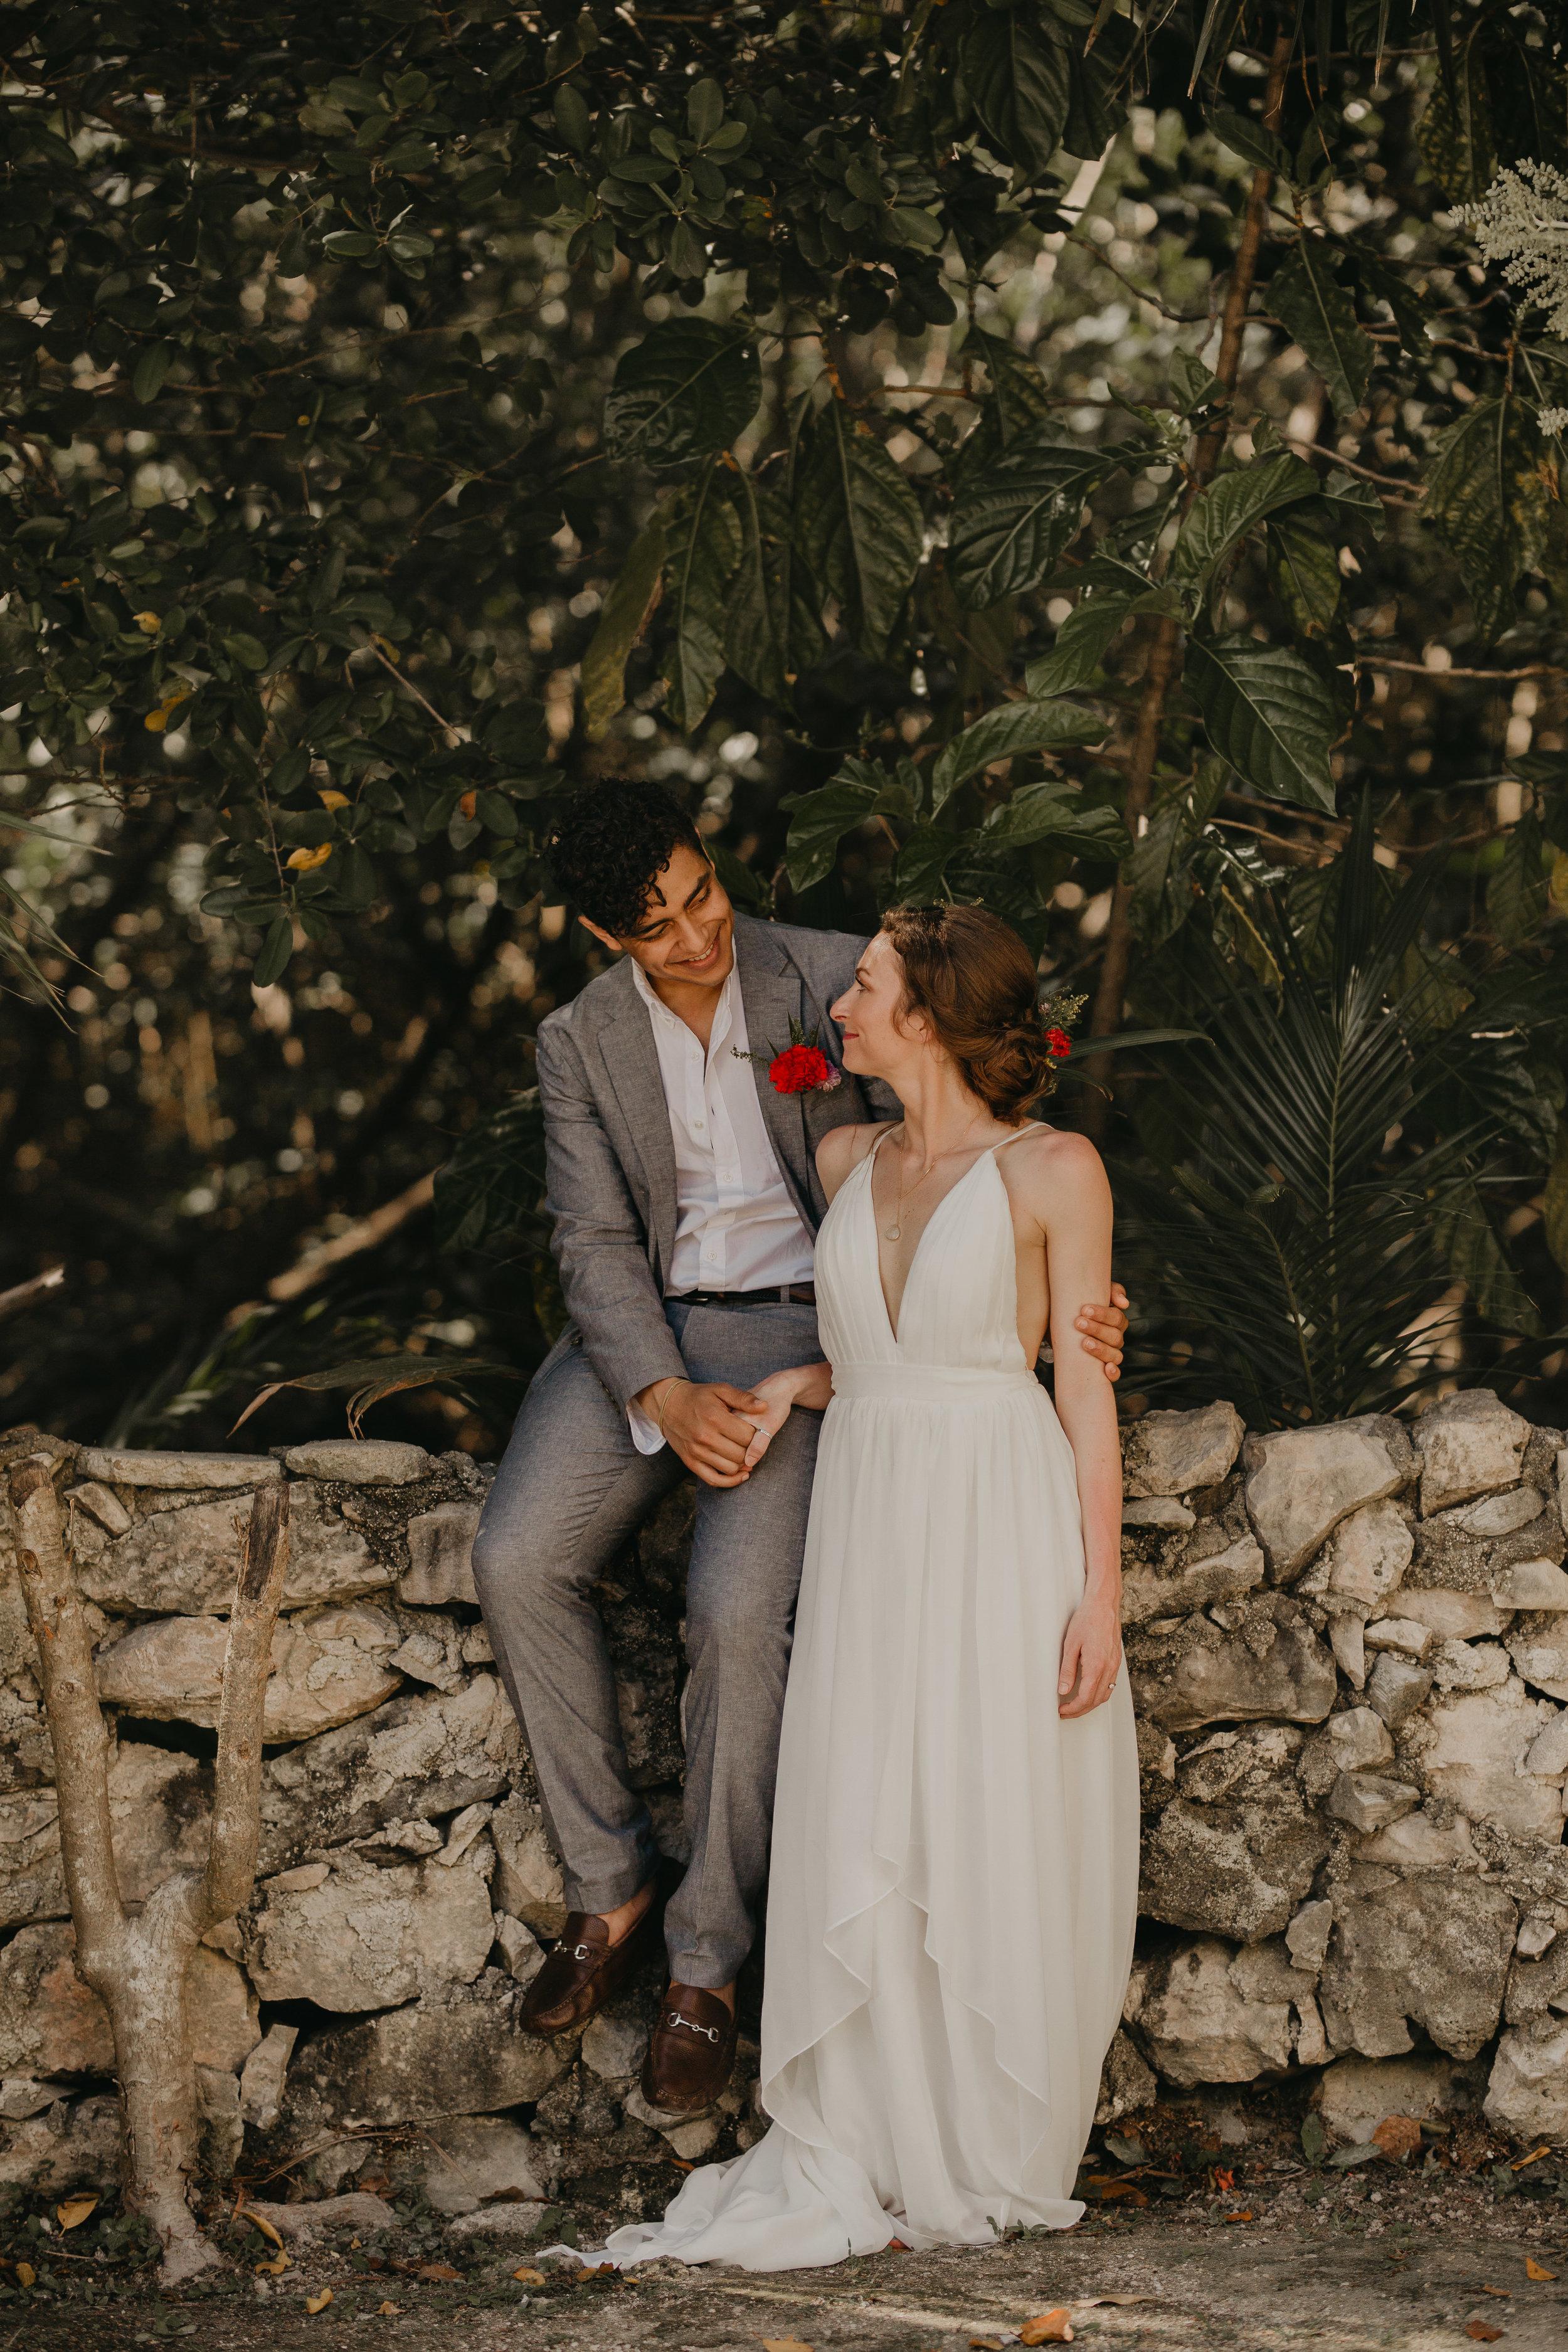 Nicole-Daacke-Photography-beachfront-akumal-destionation-wedding-tulum-mexico-elopement-photographer-destination-wedding-inspiration-sunset-champagne-pop-boho-bride-ocean-tropical-bohemian-tulum-wedding-photos-130.jpg